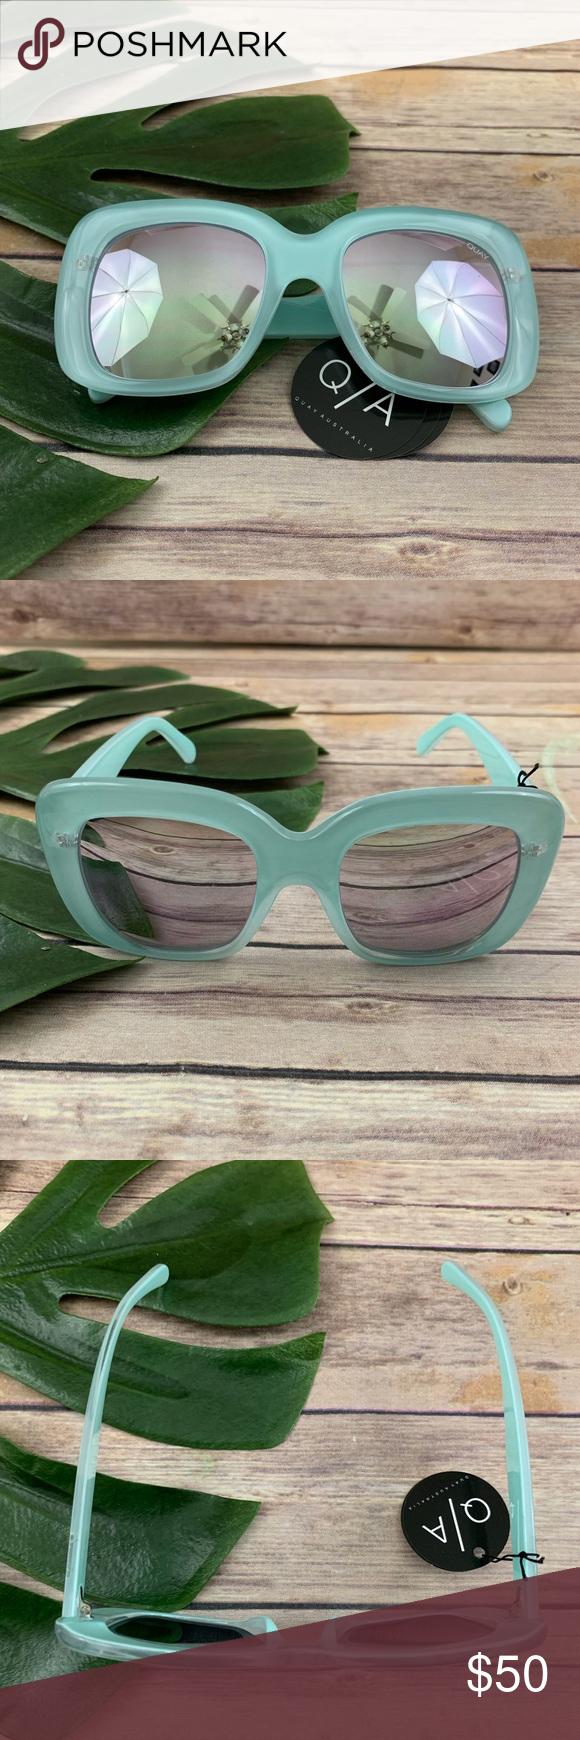 72a4d1816b5 Quay Australia mint green square frame sunglasses Quay Australia  day after  day  mint green